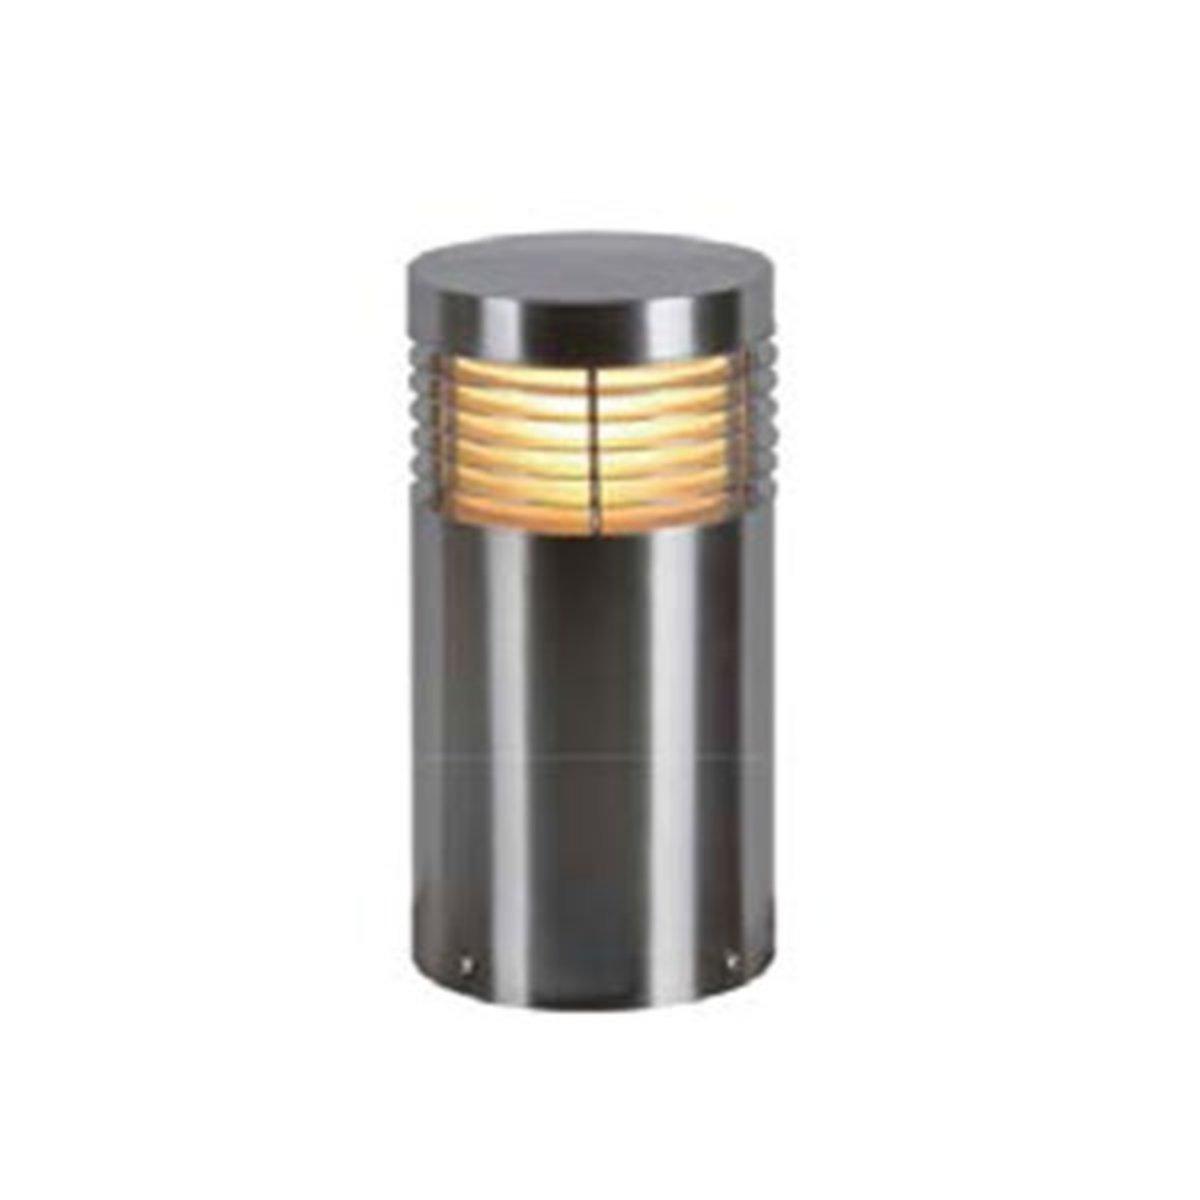 Stainless Steel Bollard Bullard Bollards Lighting